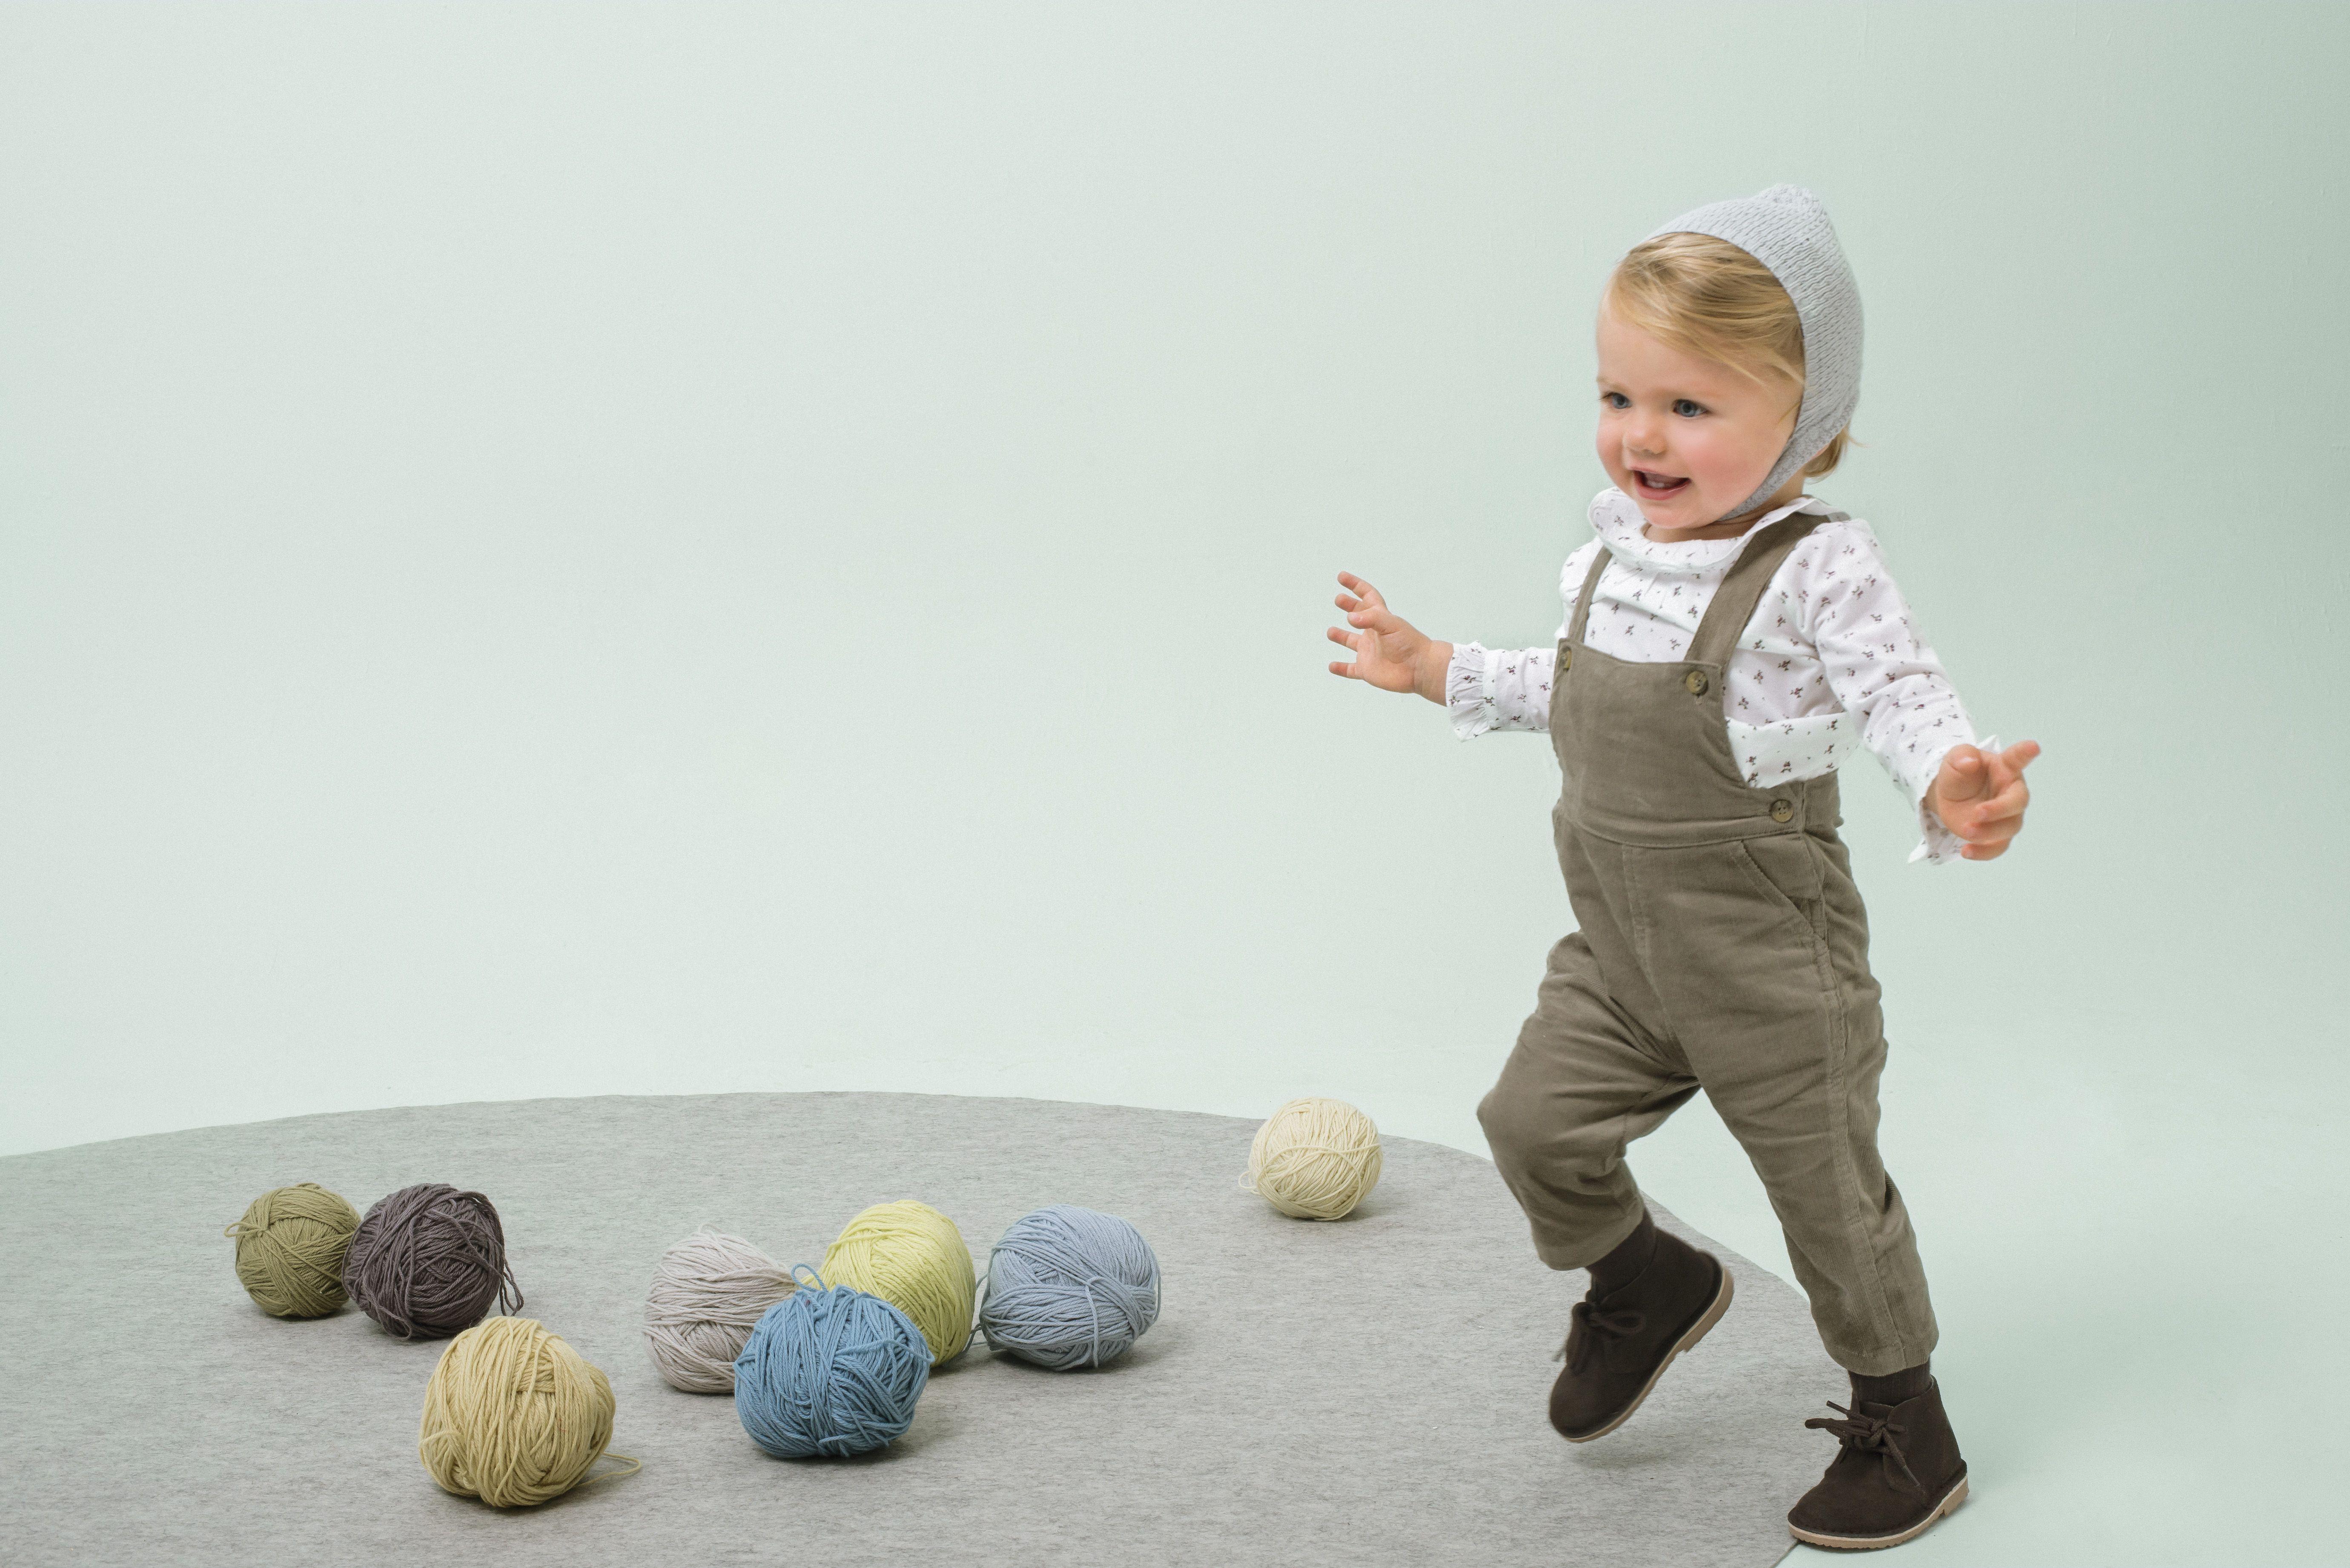 Cute first steps #gocco #goccokids #moda #fashion #bebes #babies #cute #adorable #charming #sweet #lovely  #nice www.gocco.com